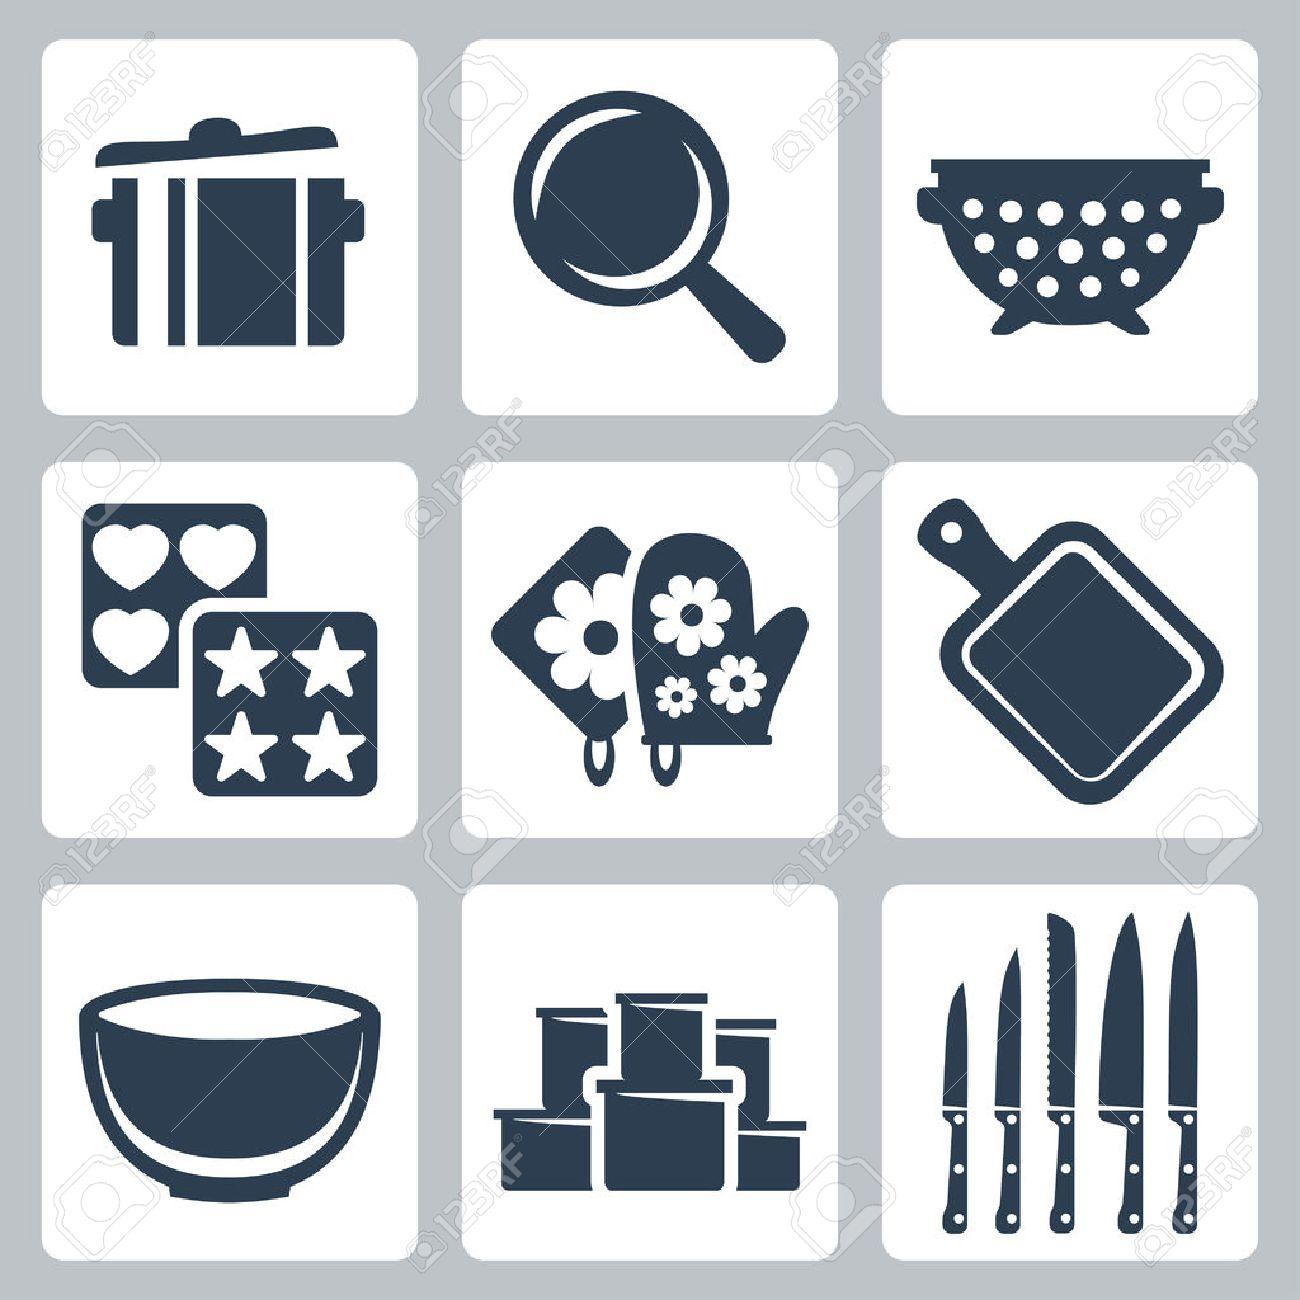 Vector Aislados Iconos Utensilios De Cocina Conjunto Olla, Sartén ...